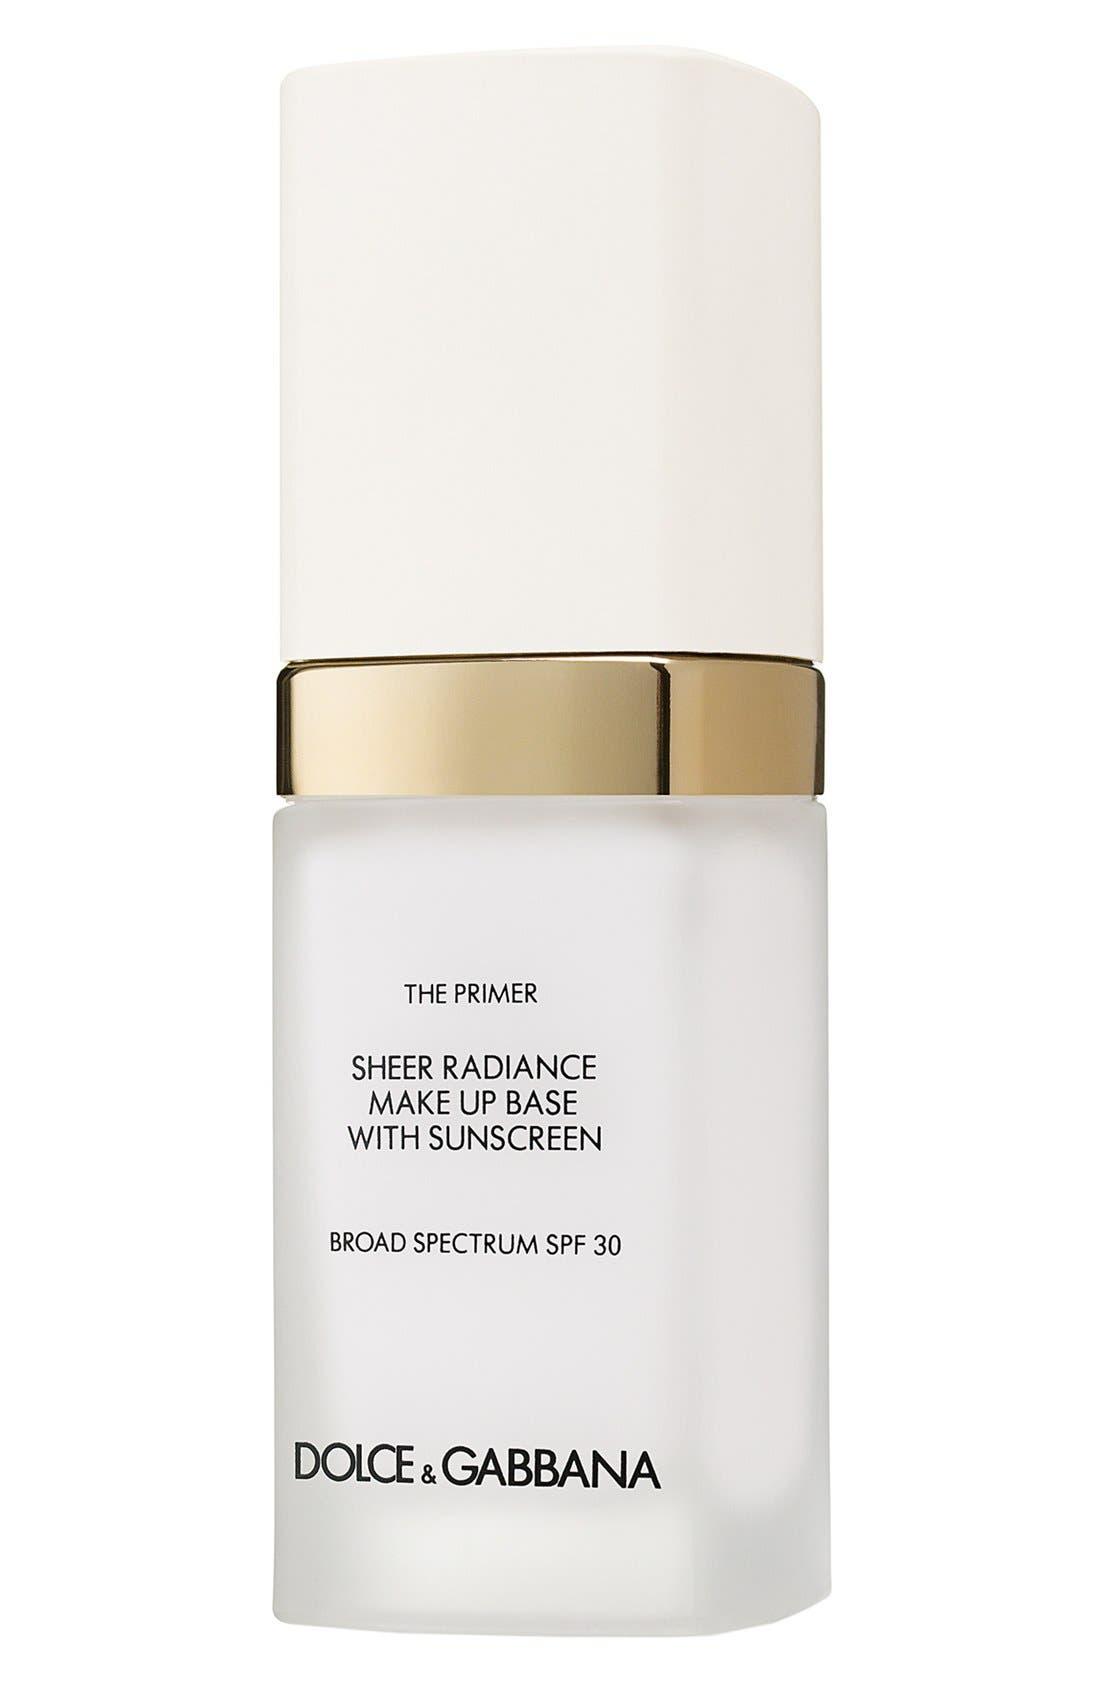 Dolce&Gabbana Beauty 'The Primer' Makeup Base